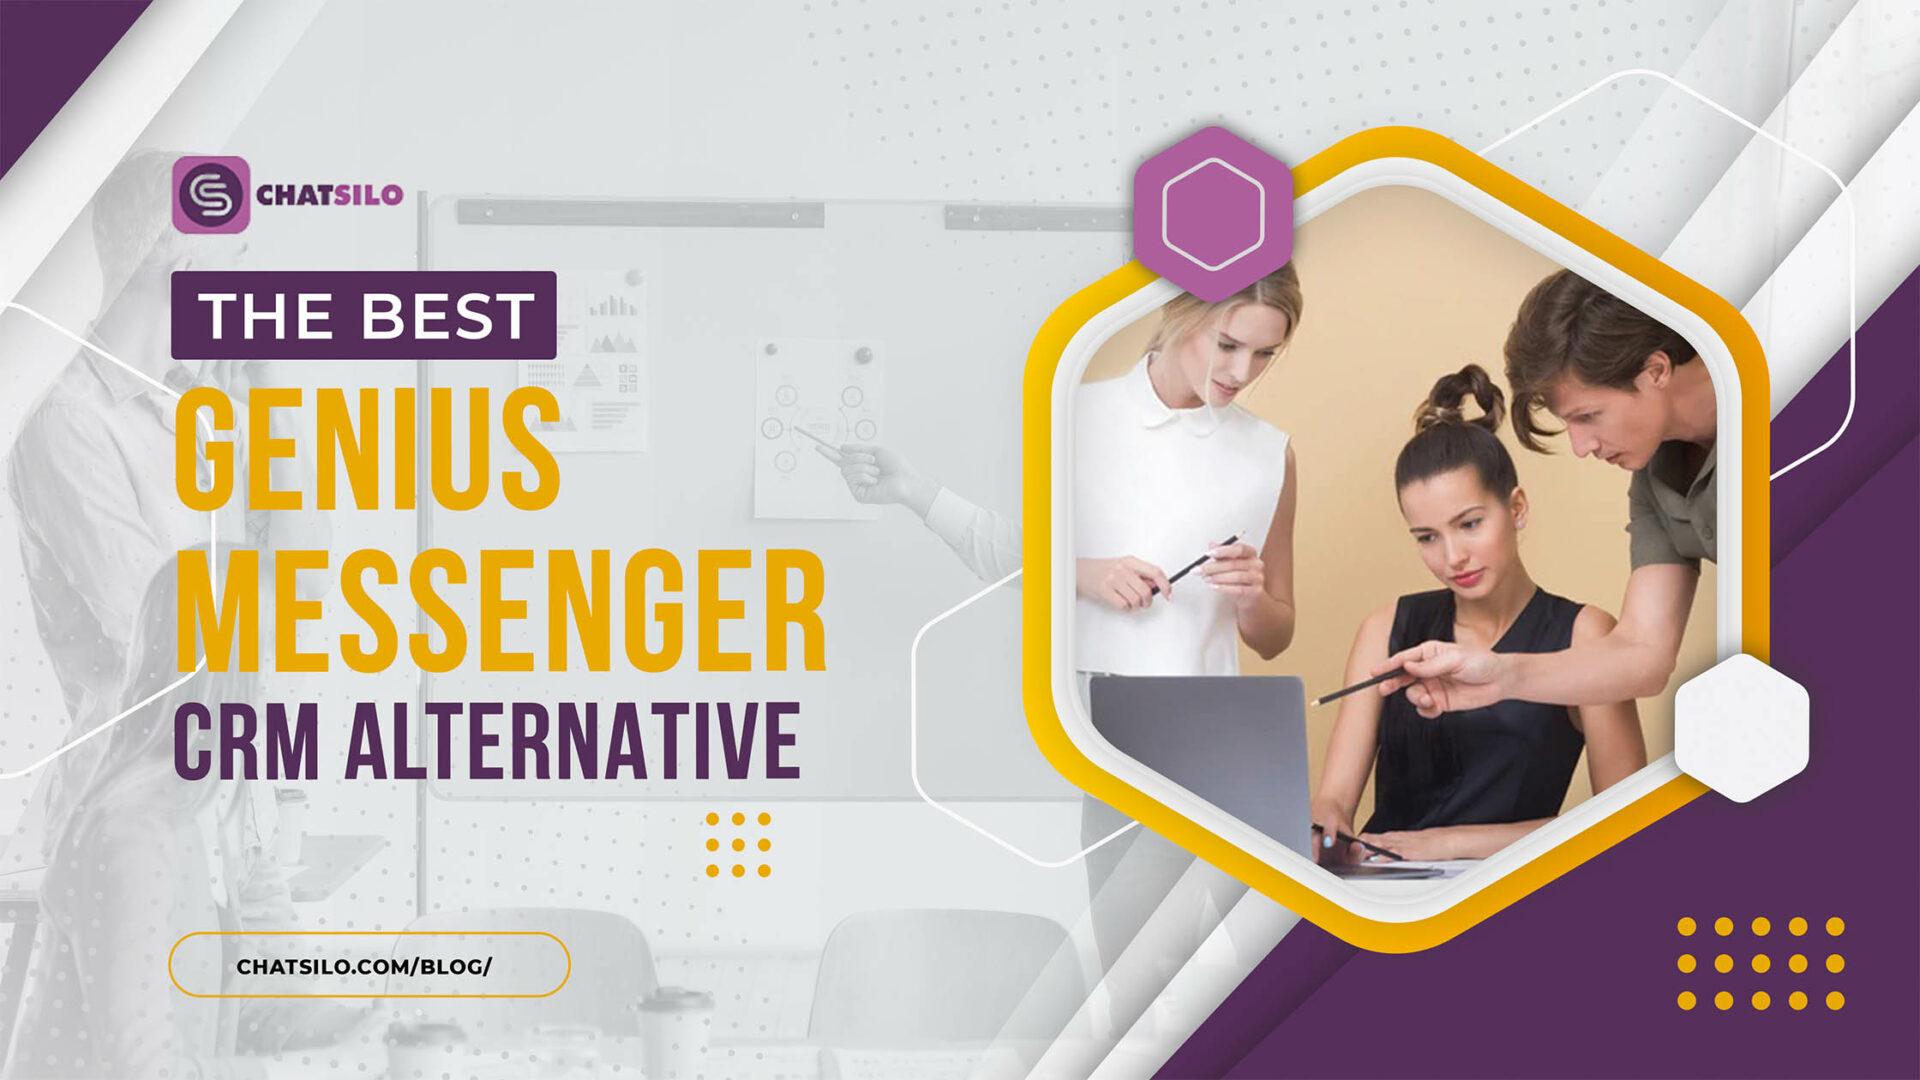 The Best Genius Messenger CRM Alternative